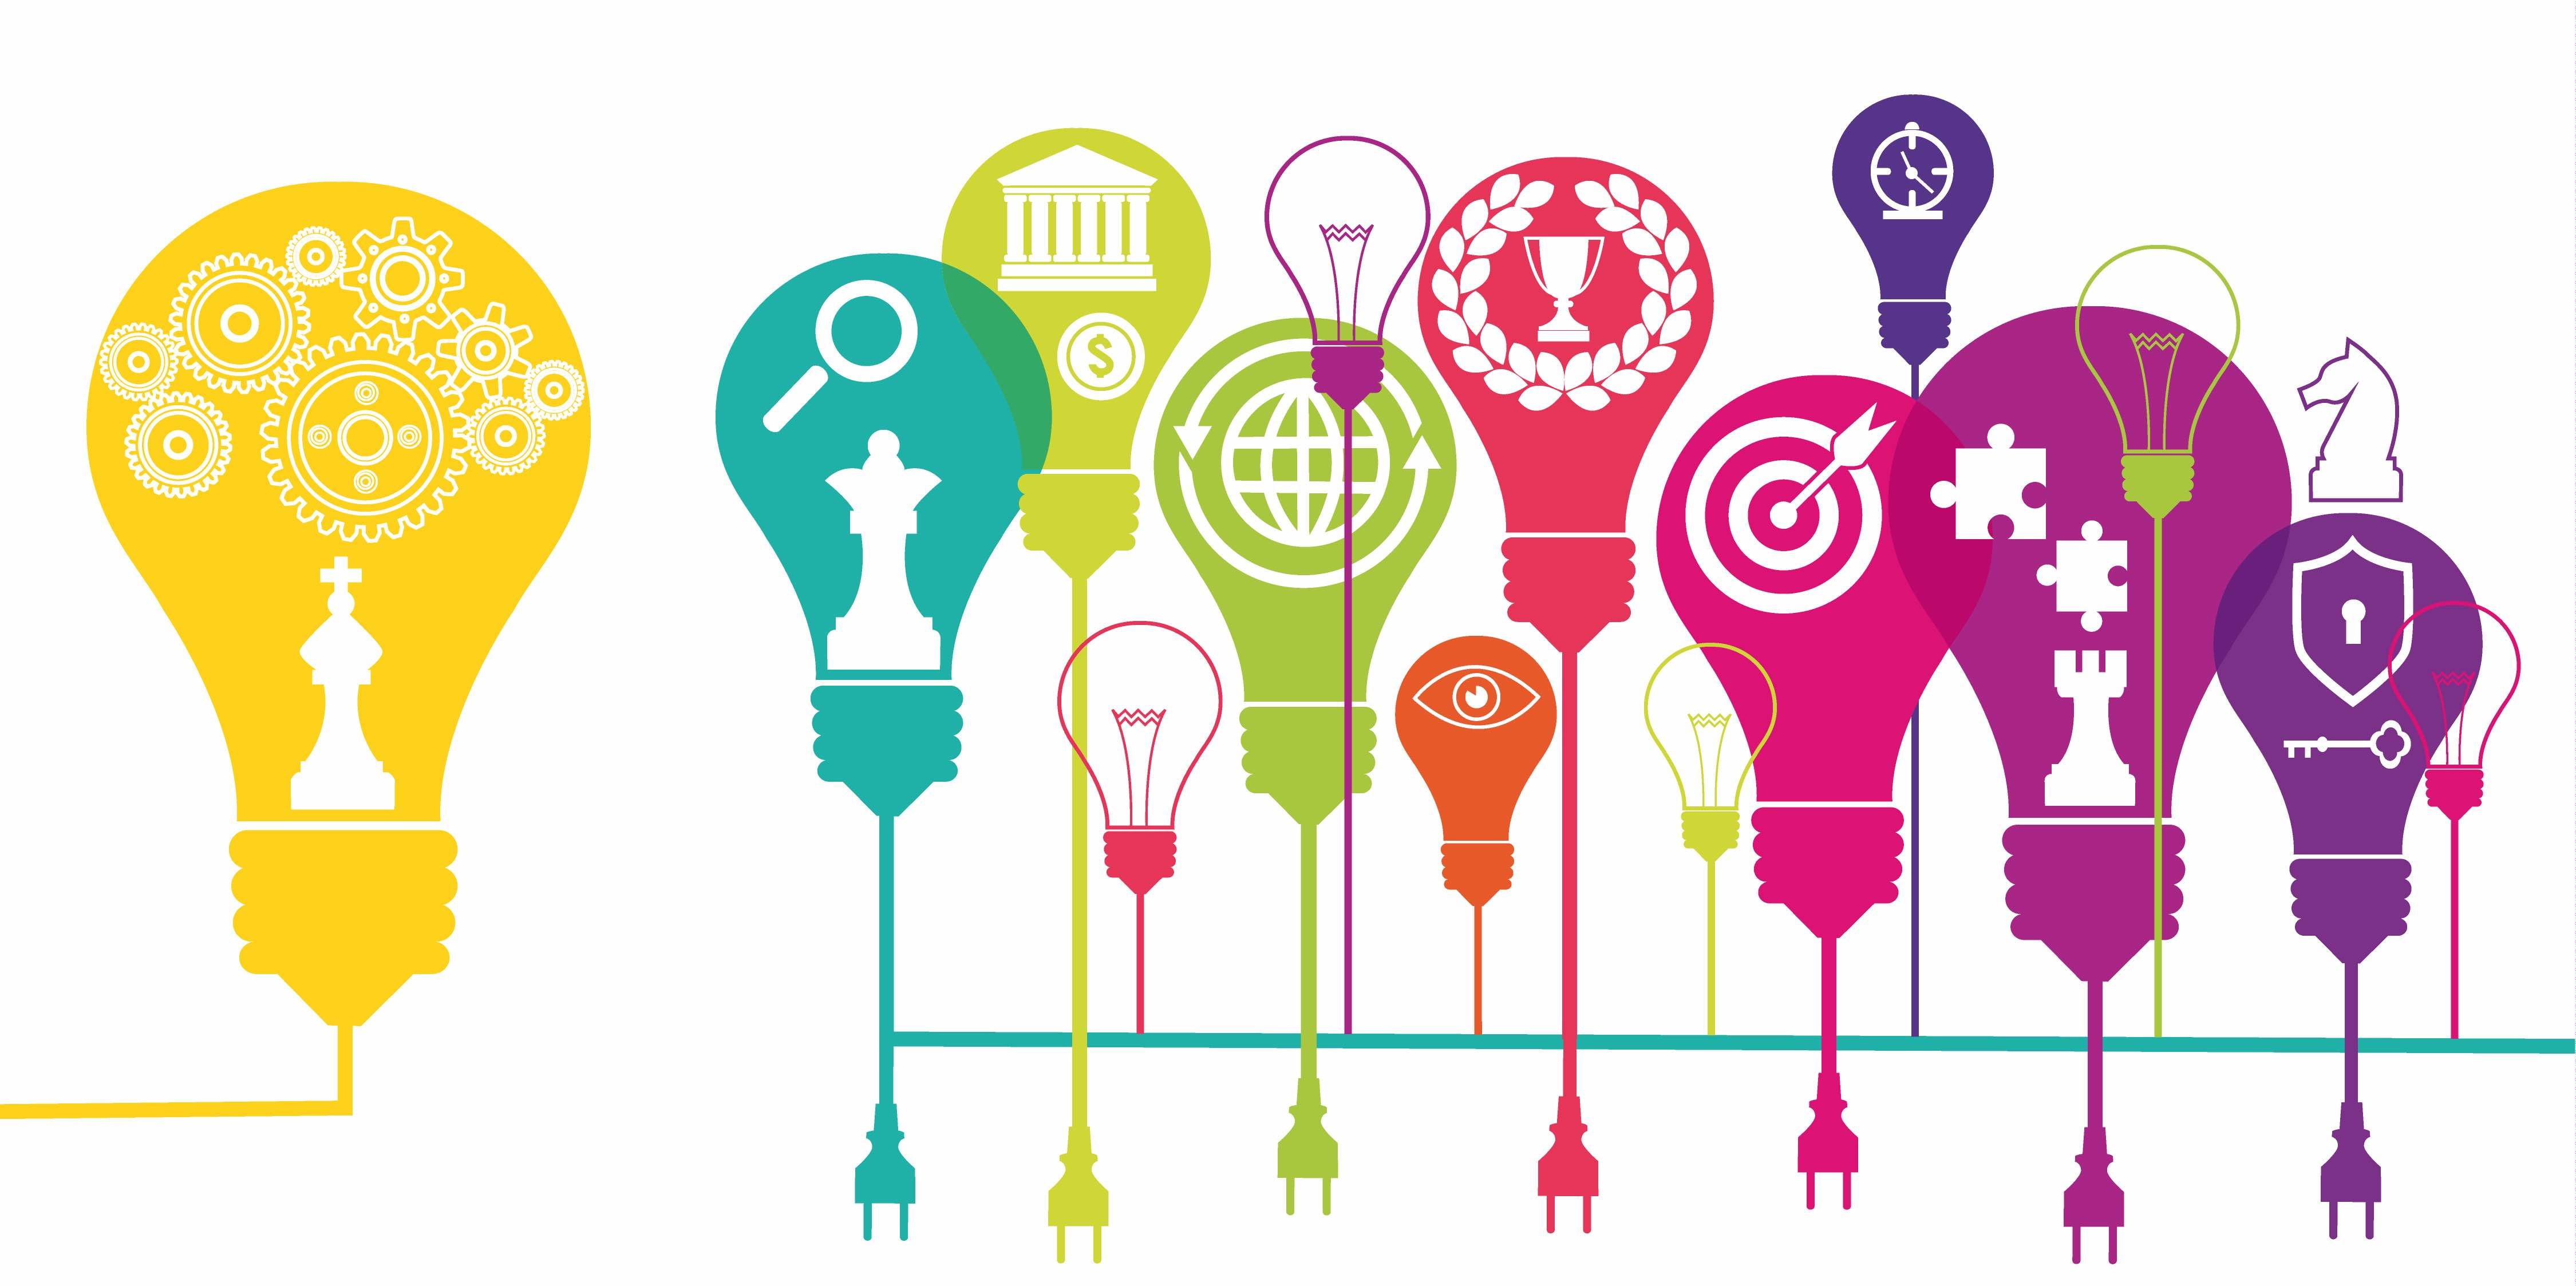 Creative activity guide for idea generation